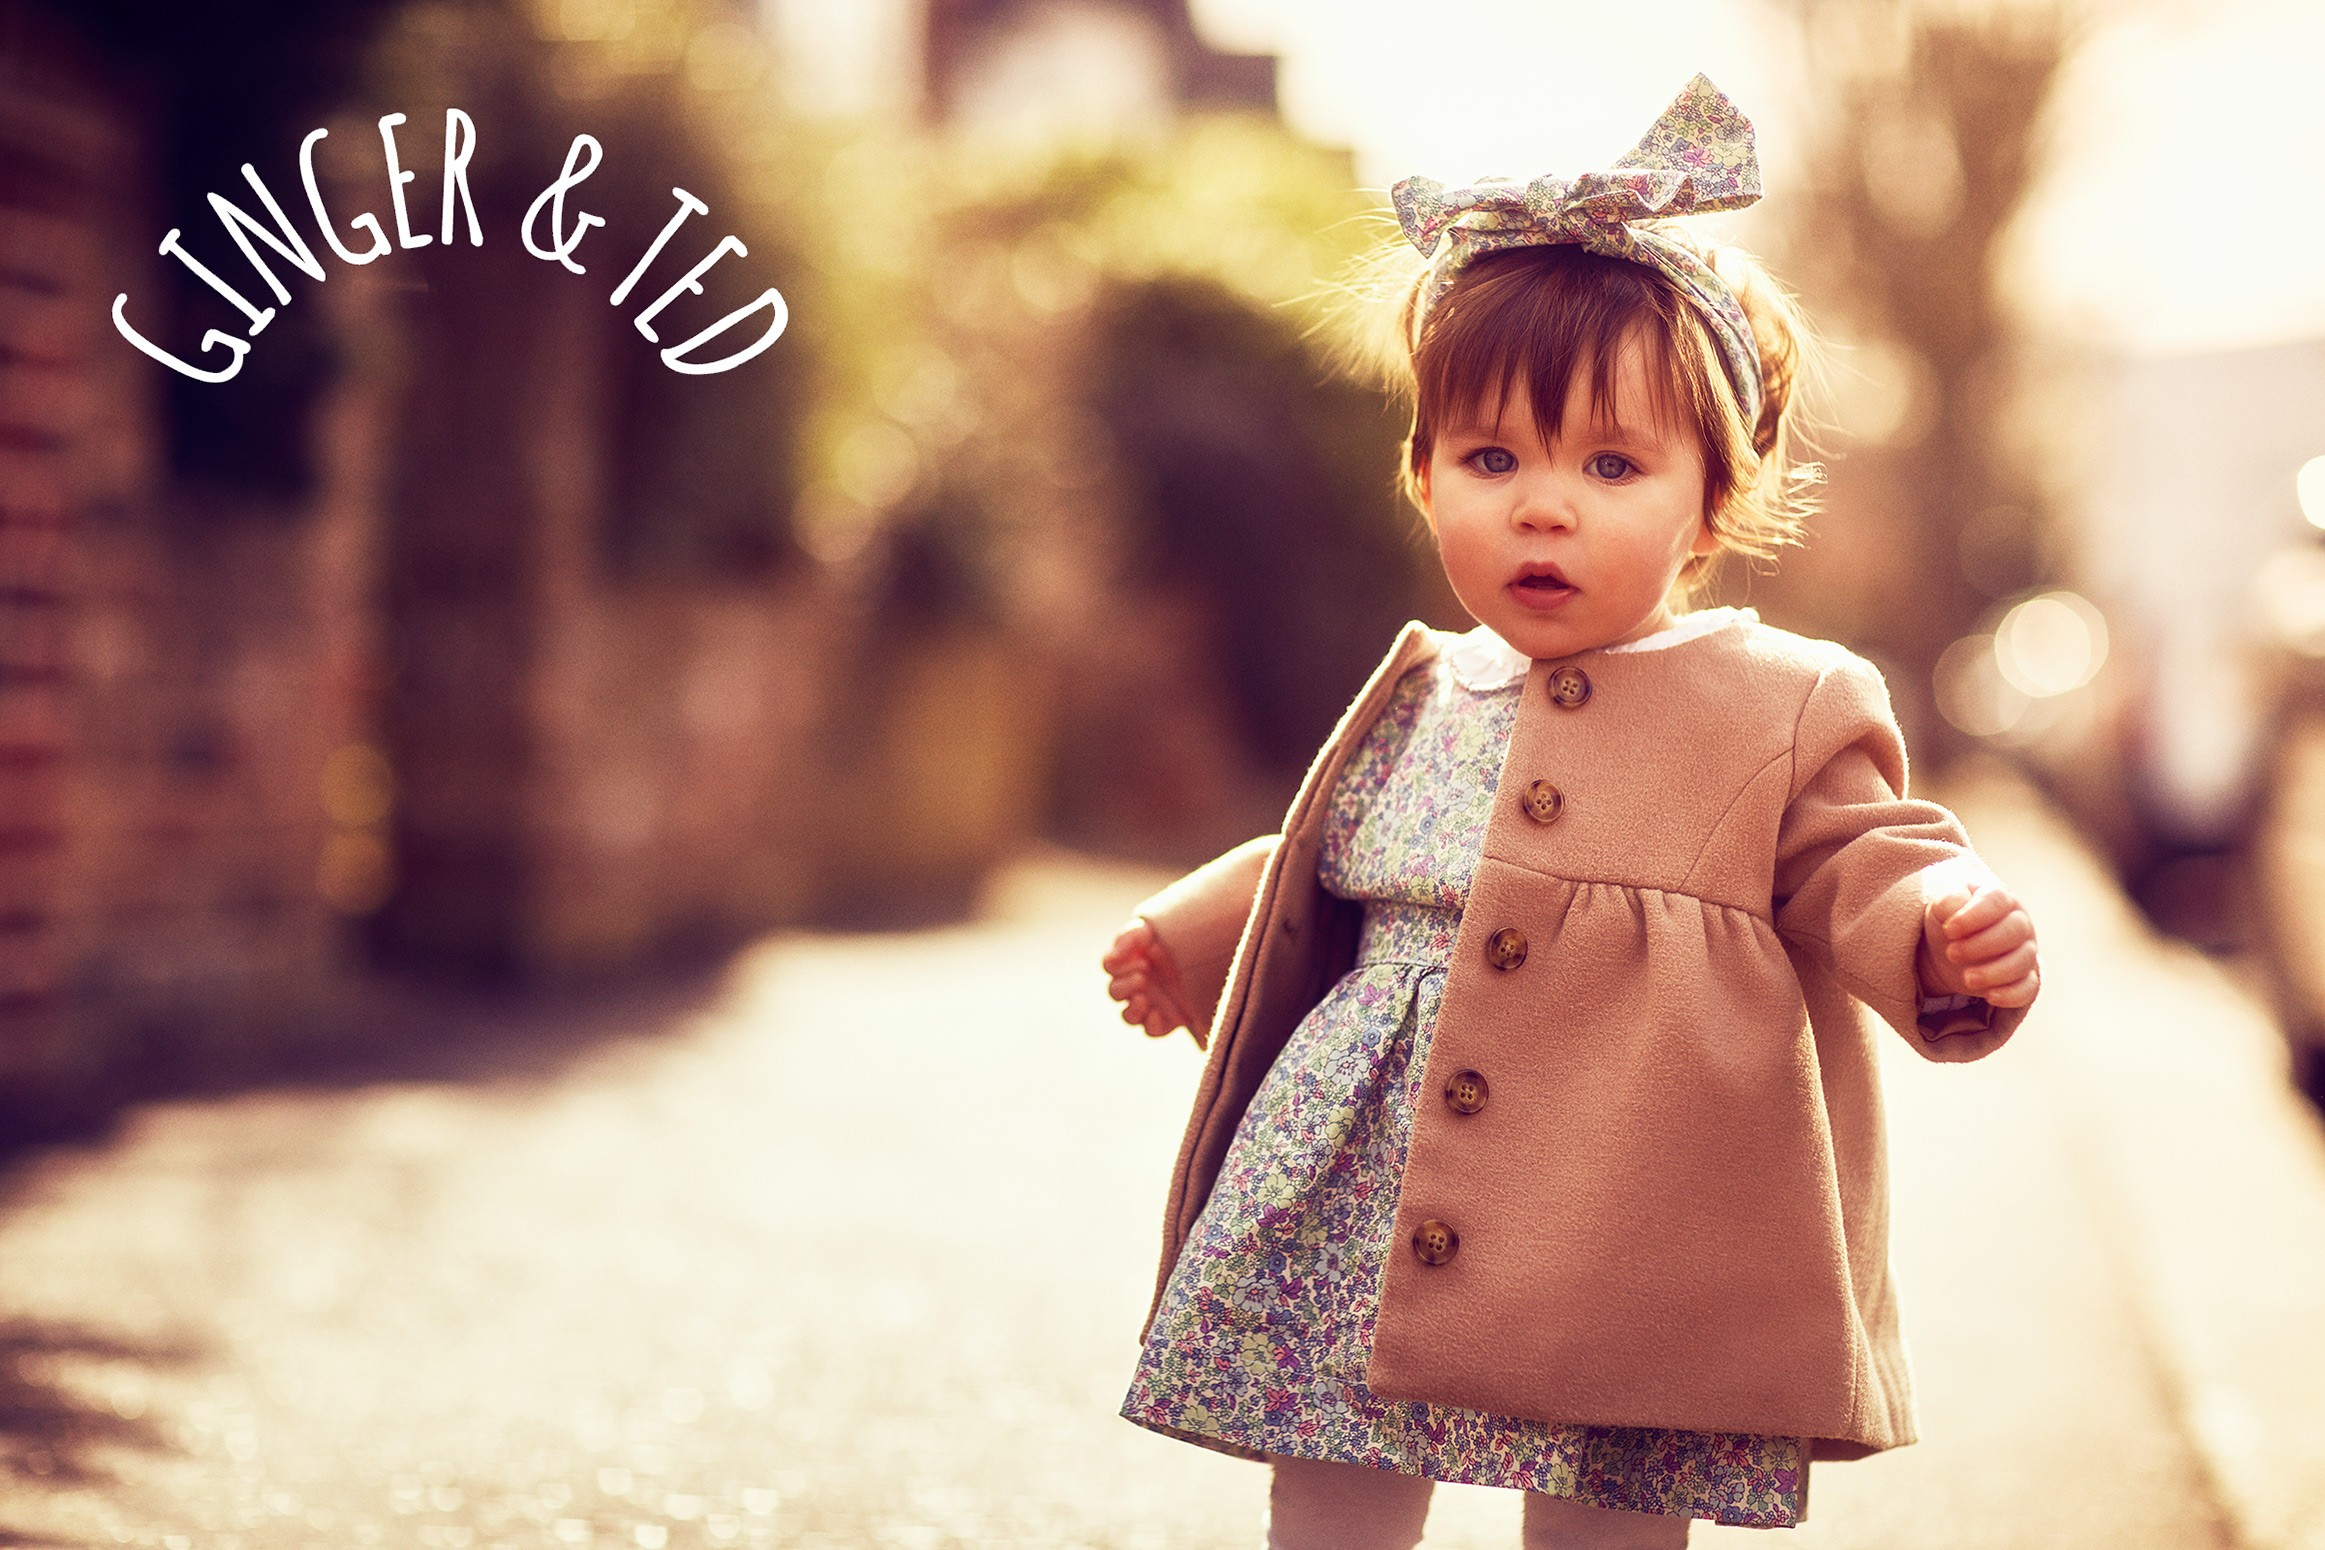 kids-childrens-shoot-fashion-photoshoot-location-photography-photographer-teddington-ruth-rose-london-2.jpg